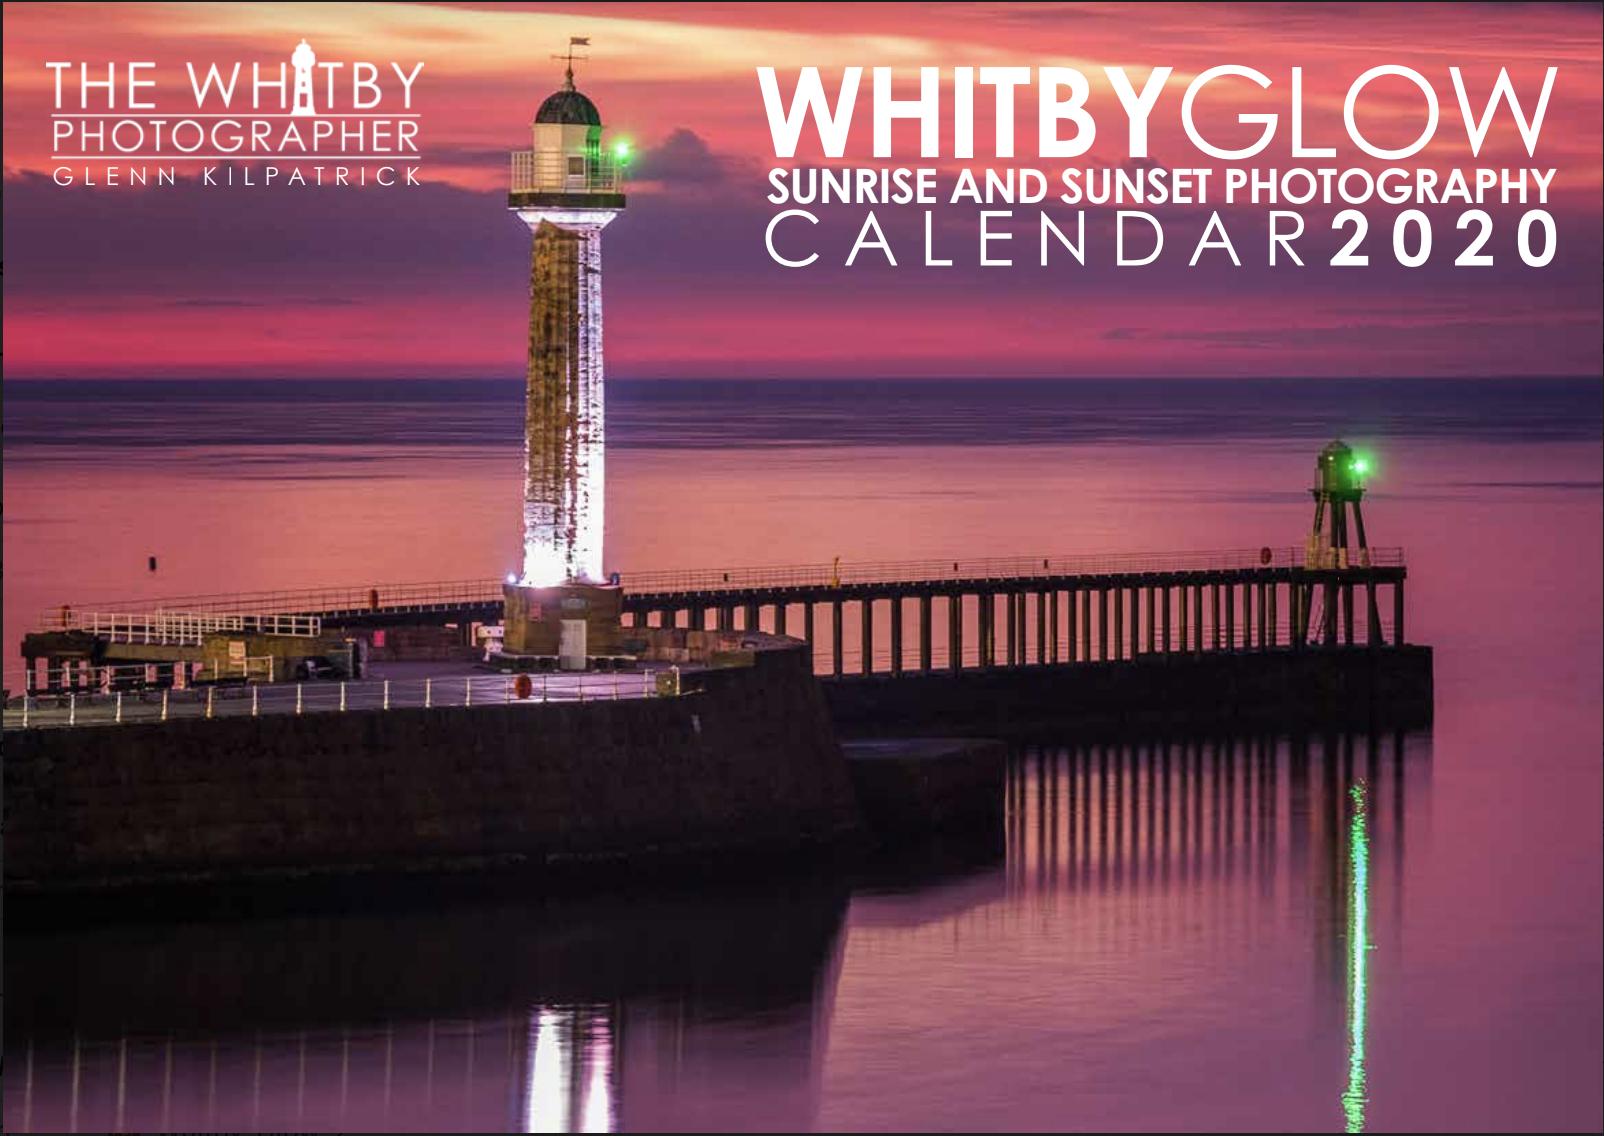 Sunset 2020 Calendar Whitby Glow Calendar 2020   Sunrise And Sunset Photography Of